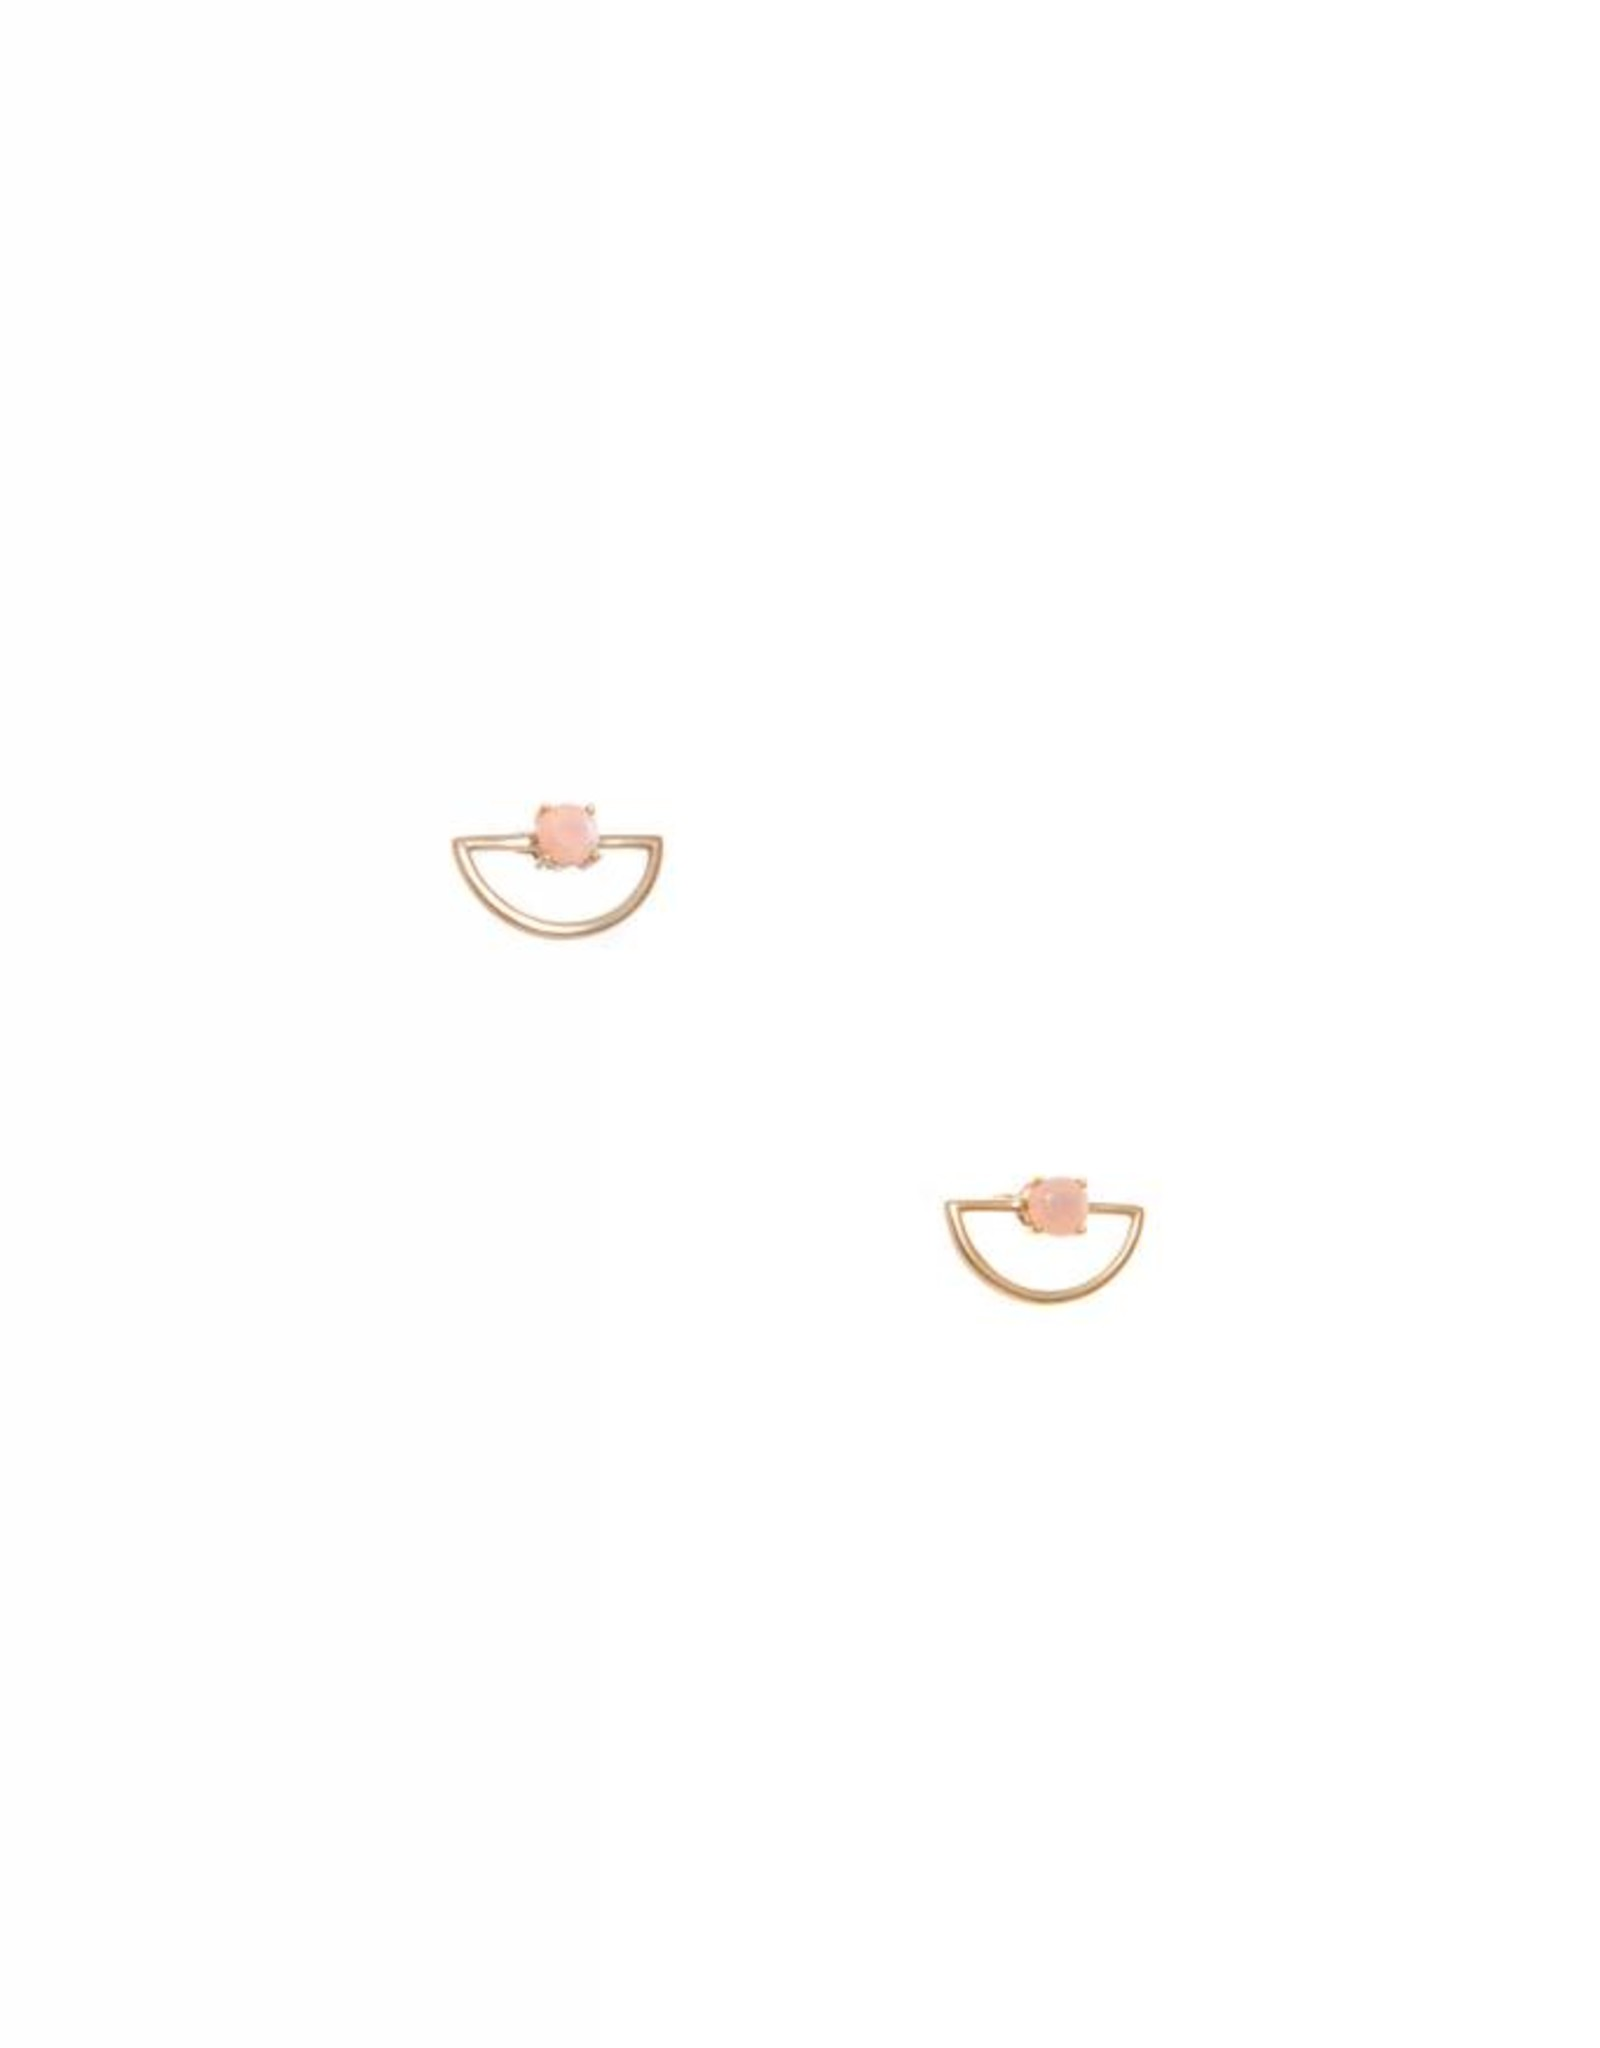 Hailey Gerrits Designs Half-Moon Studs - Peach Moonstone